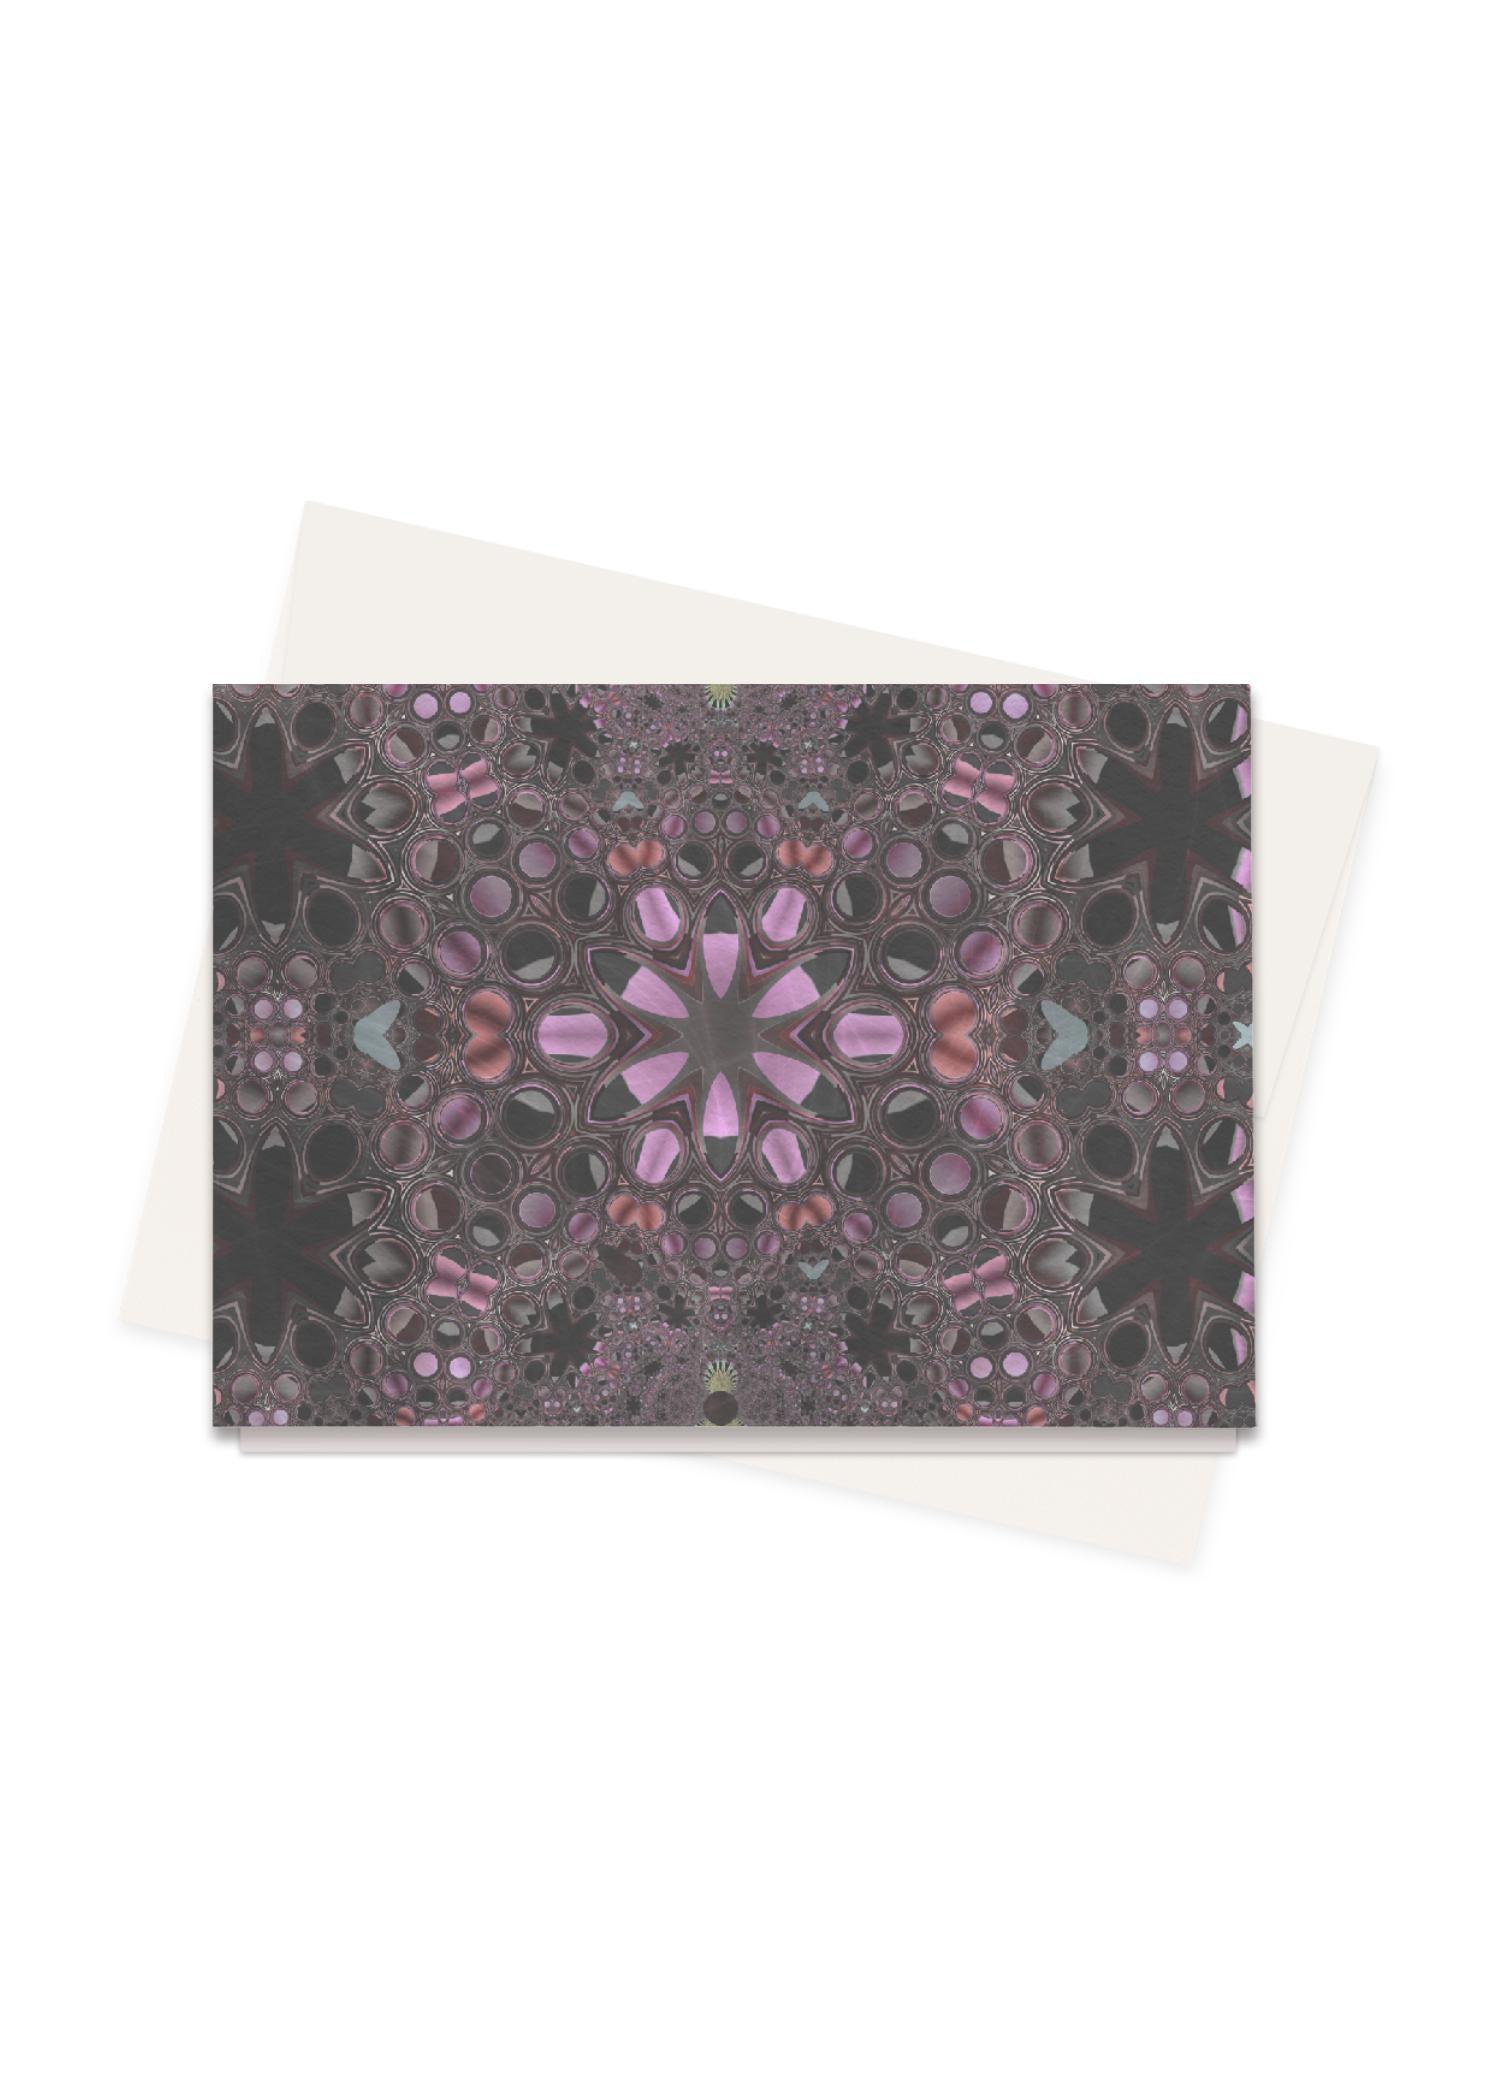 PRIDE Greeting Cards Set - Purpose #Pillows by PRIDE Original Artist  - Size: Set of 8